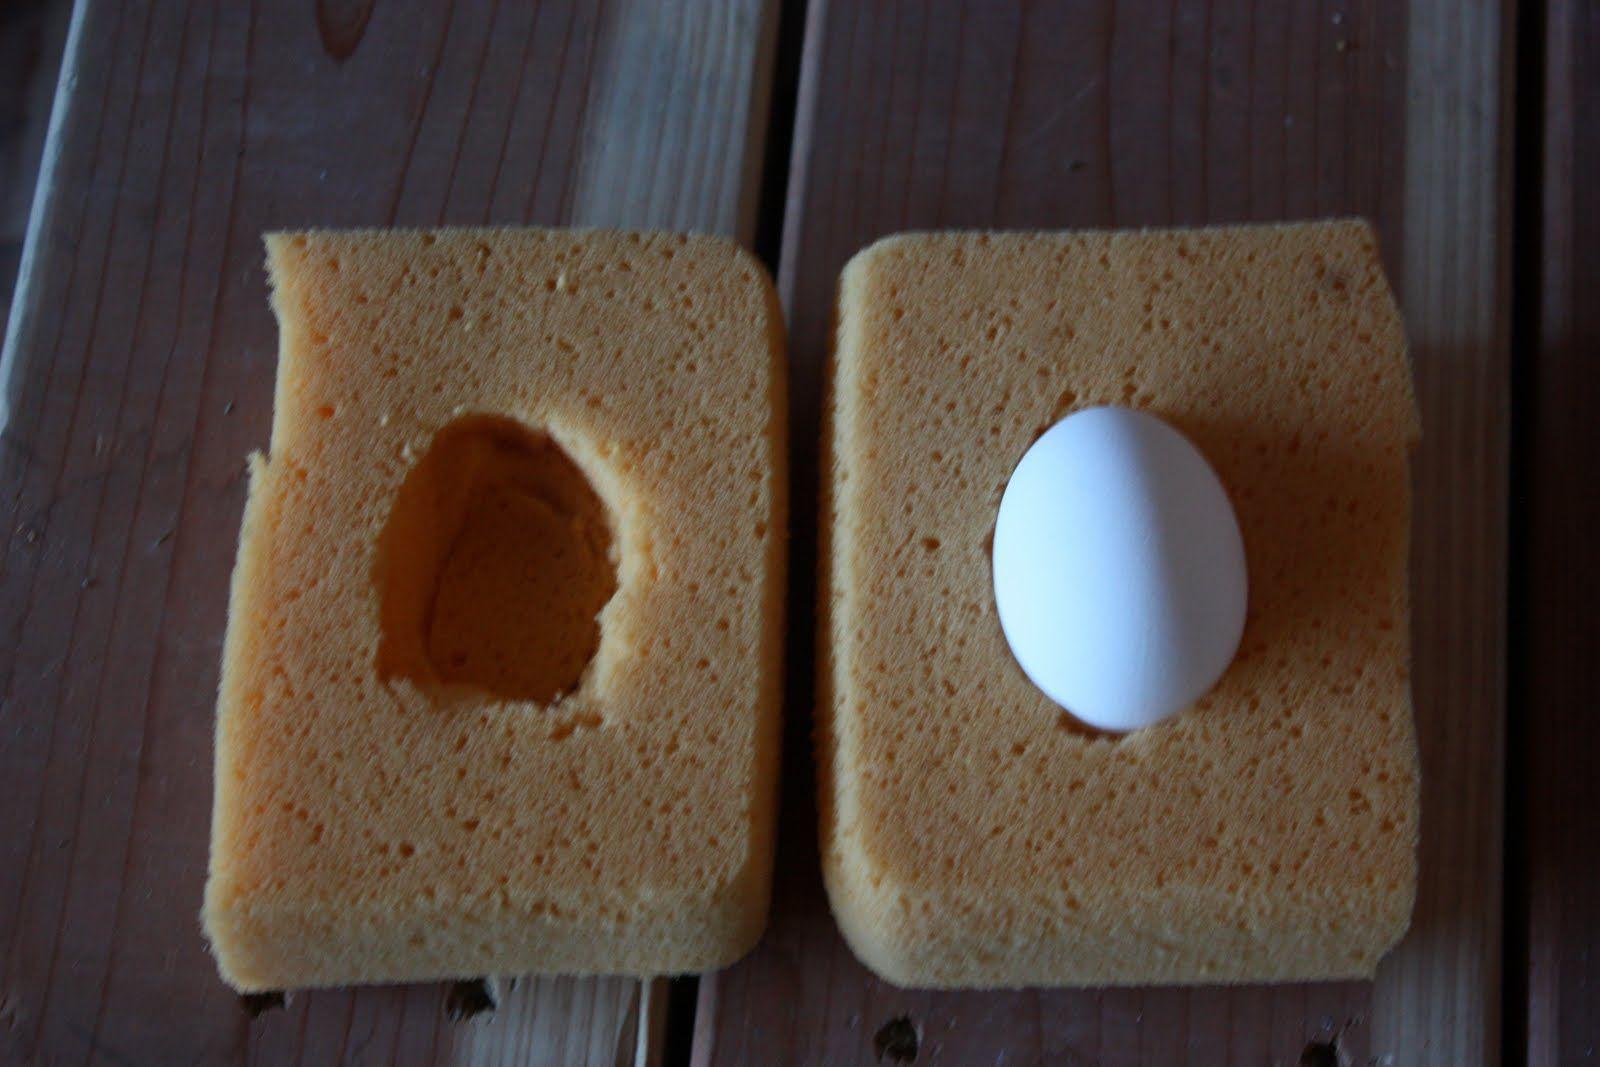 egg drop designs - google search   crafts   pinterest   egg drop